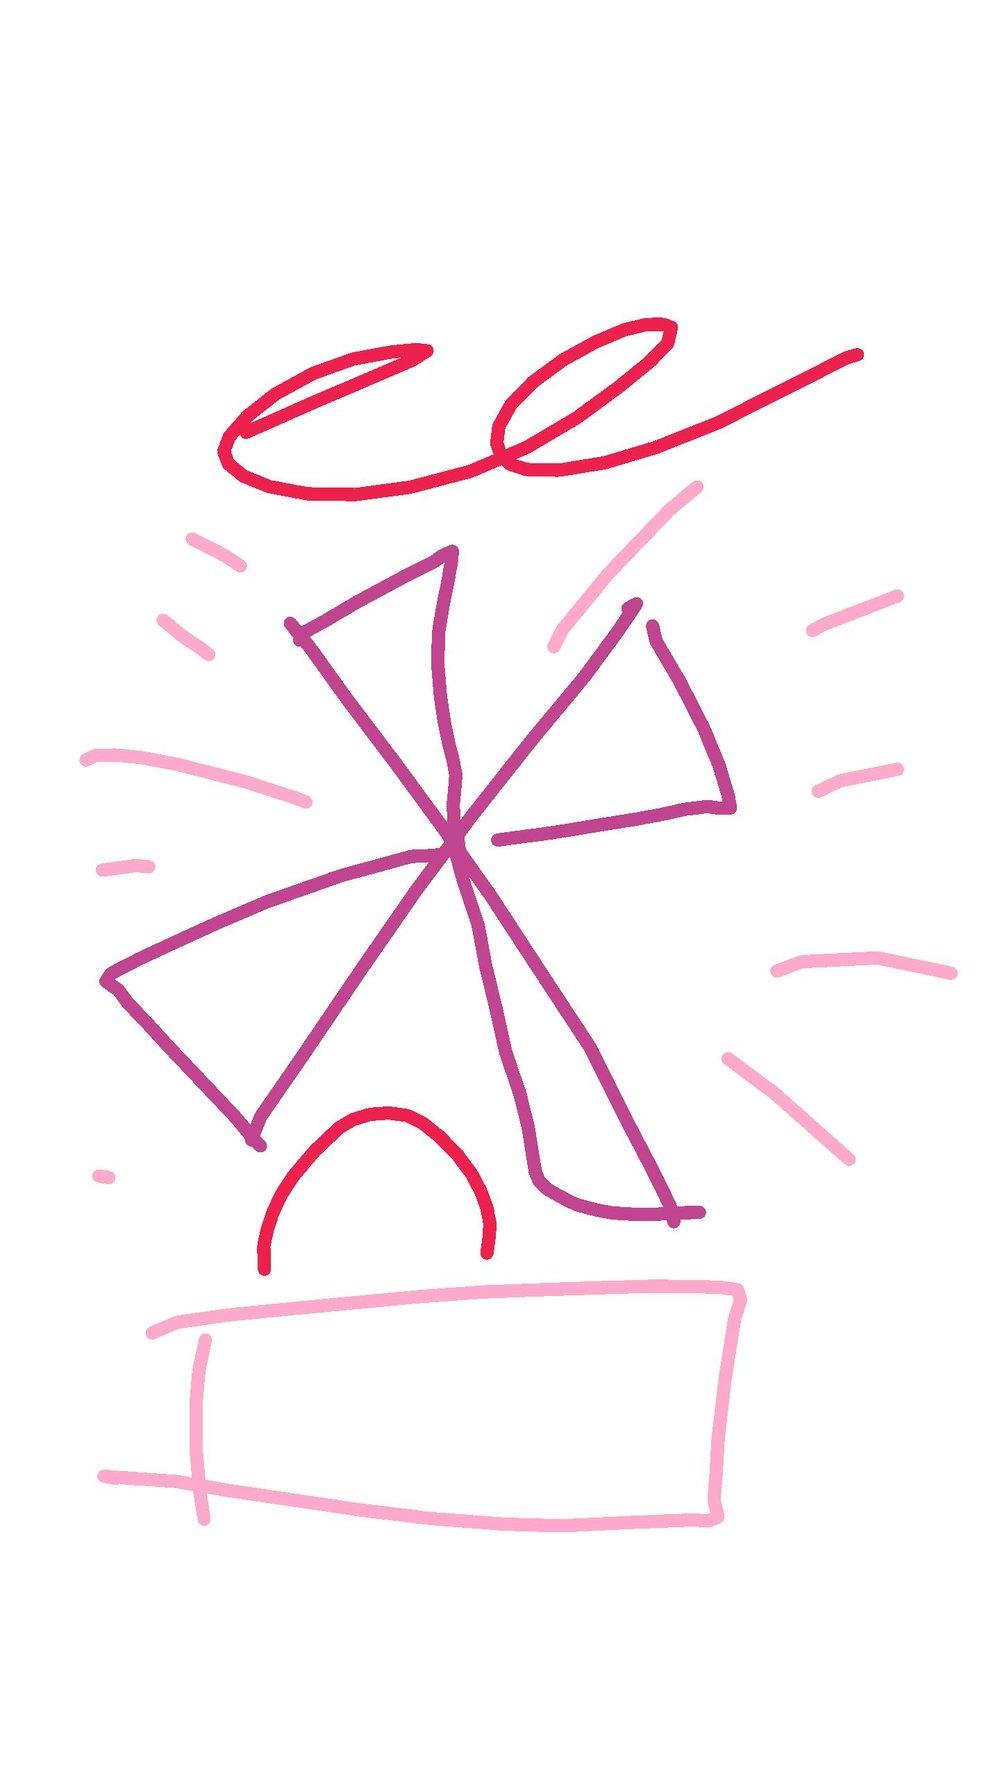 windmill_07-14-2017_23.27.04.png